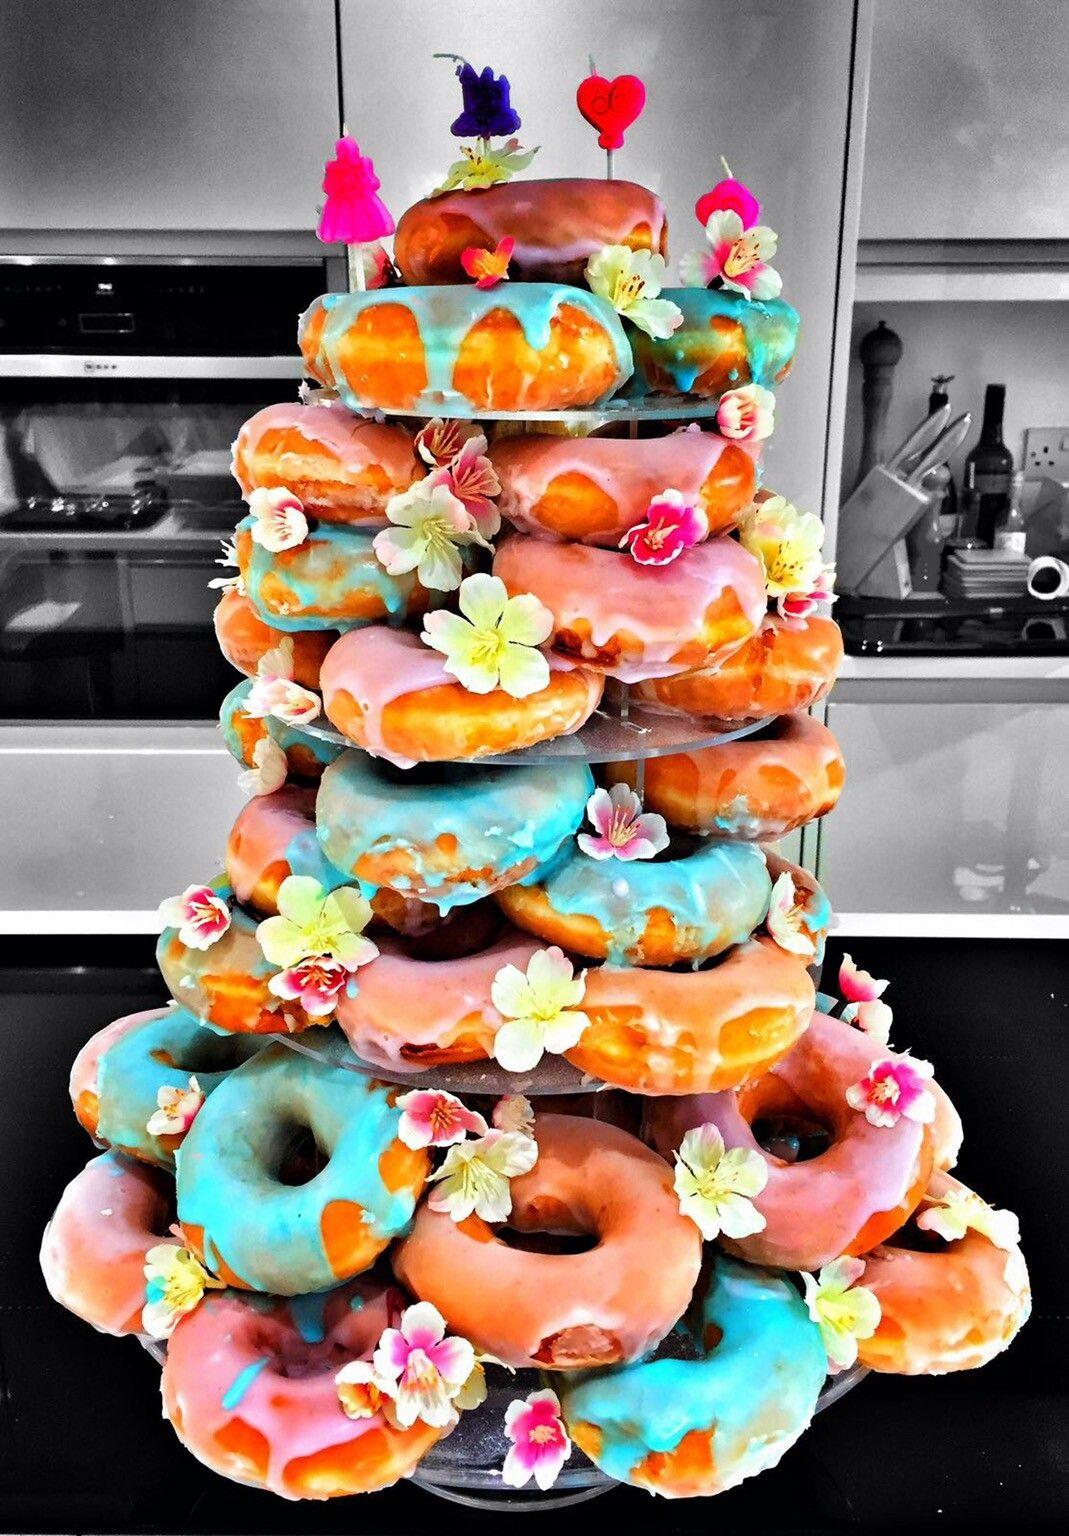 Donut tower uploaded to reddit by qyzyz festa pool